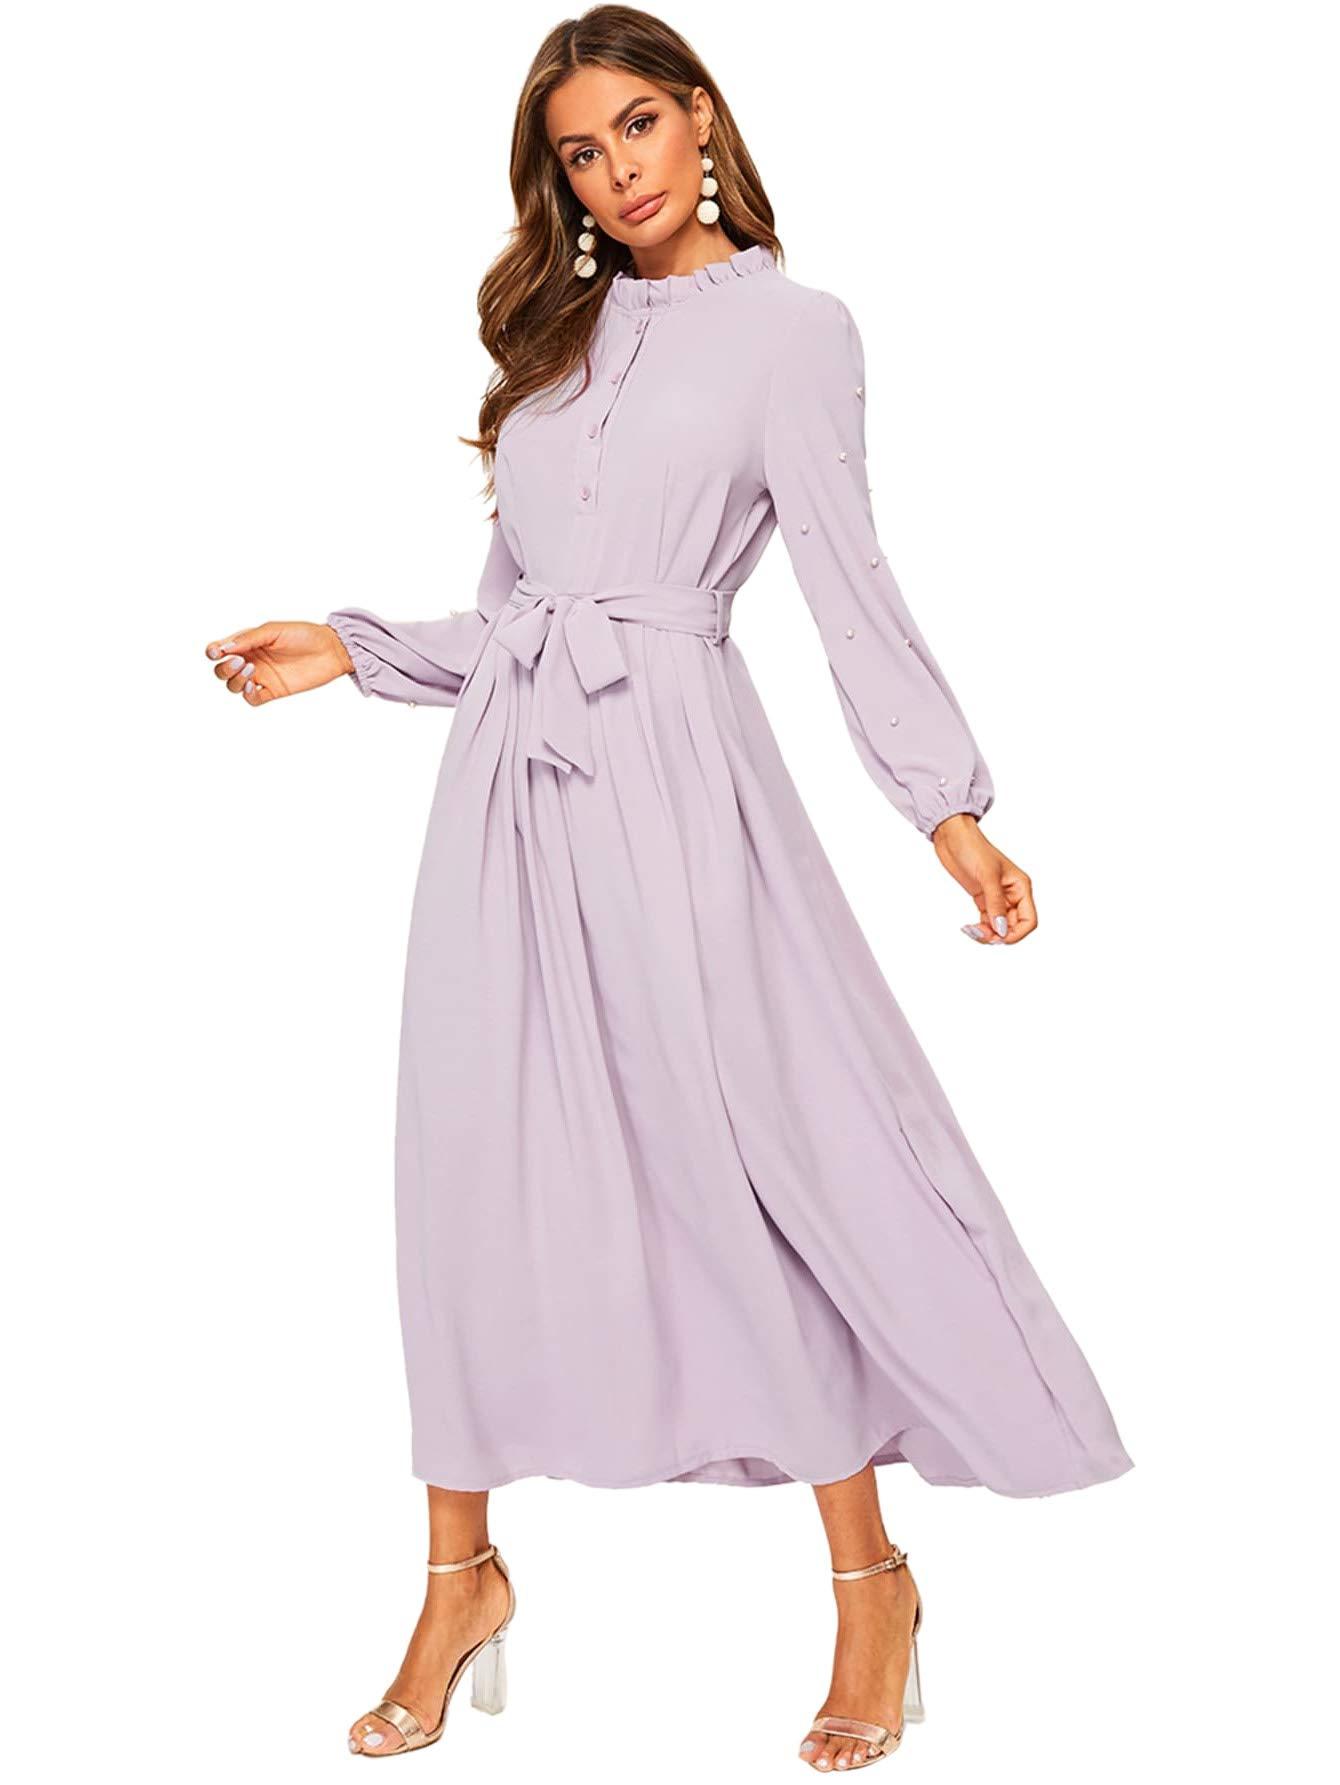 Verdusa Women's Elegant Button Front Pearls Bishop Sleeve Belted Long Dress Purple L